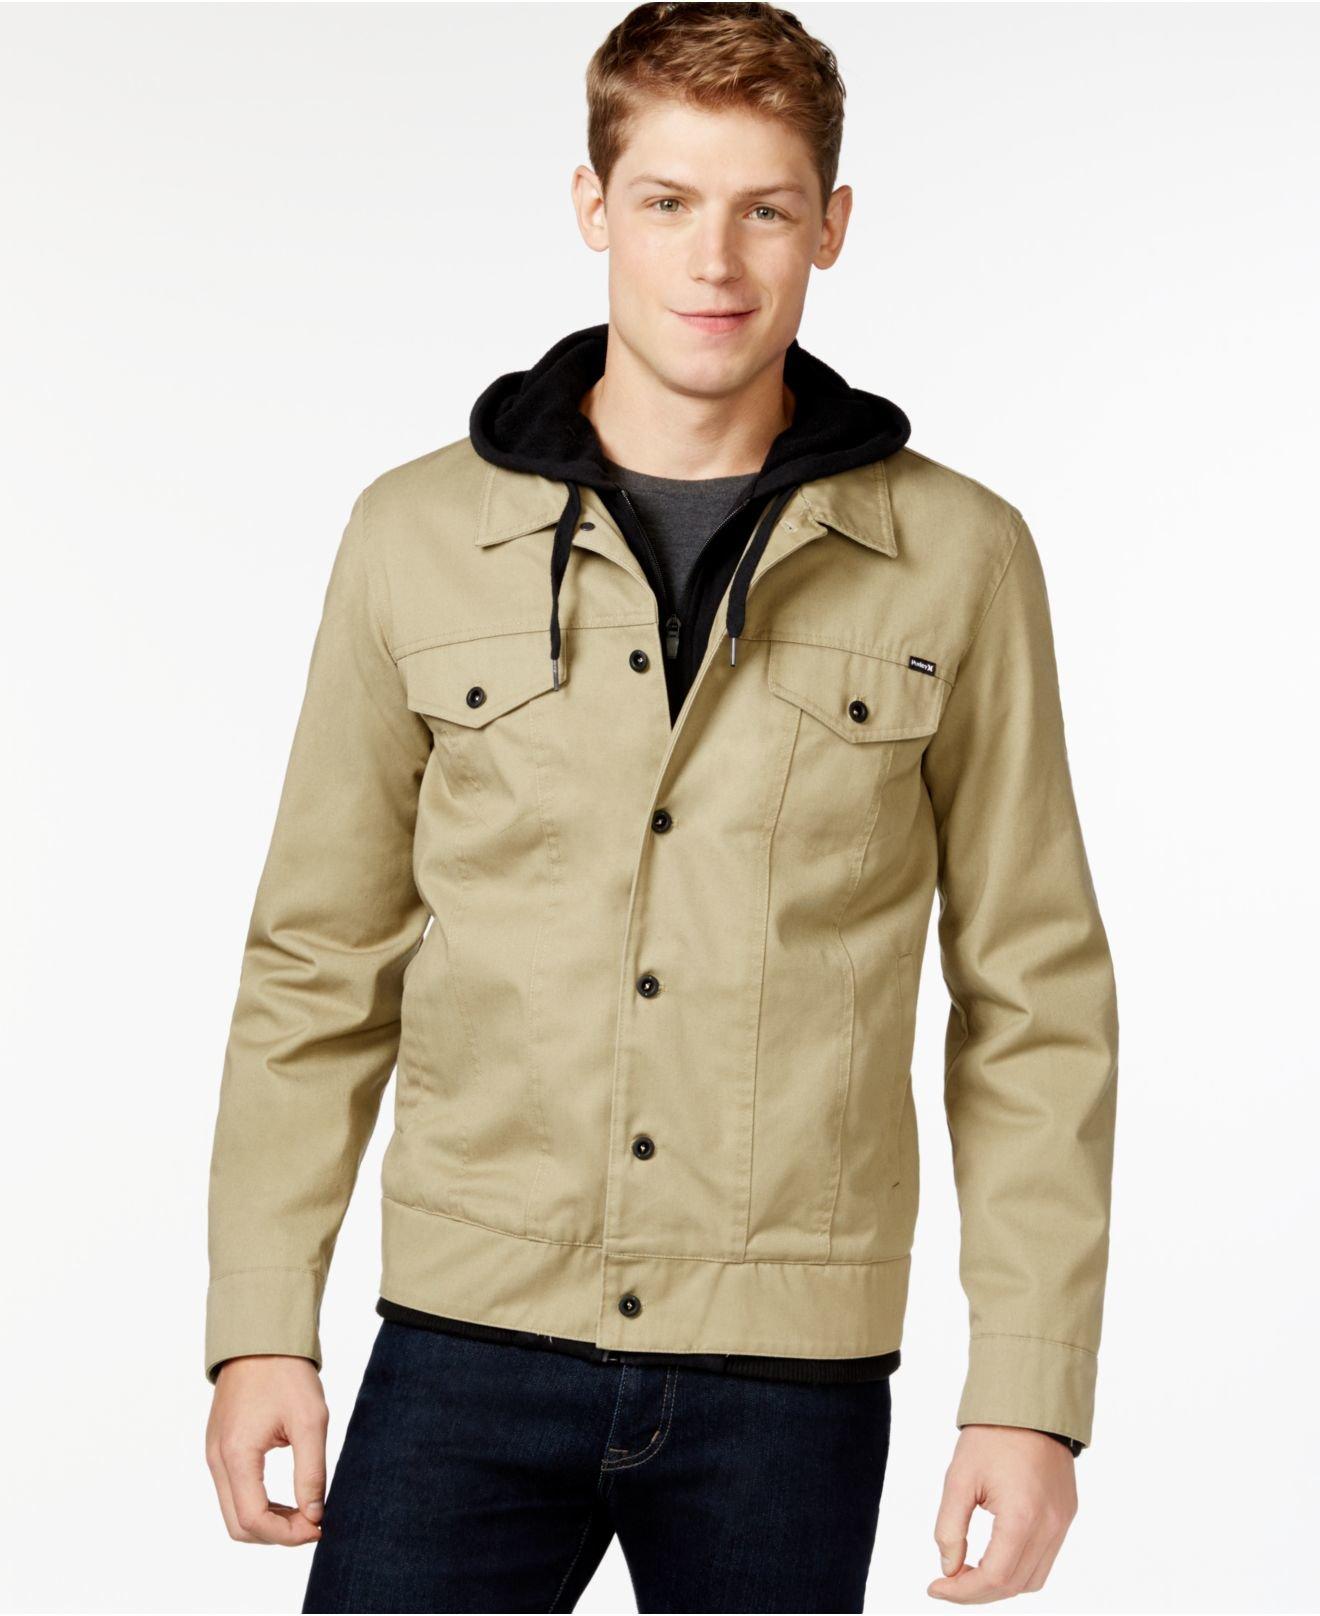 474270c4663 Lyst - Hurley Hooded Trucker Jacket in Natural for Men